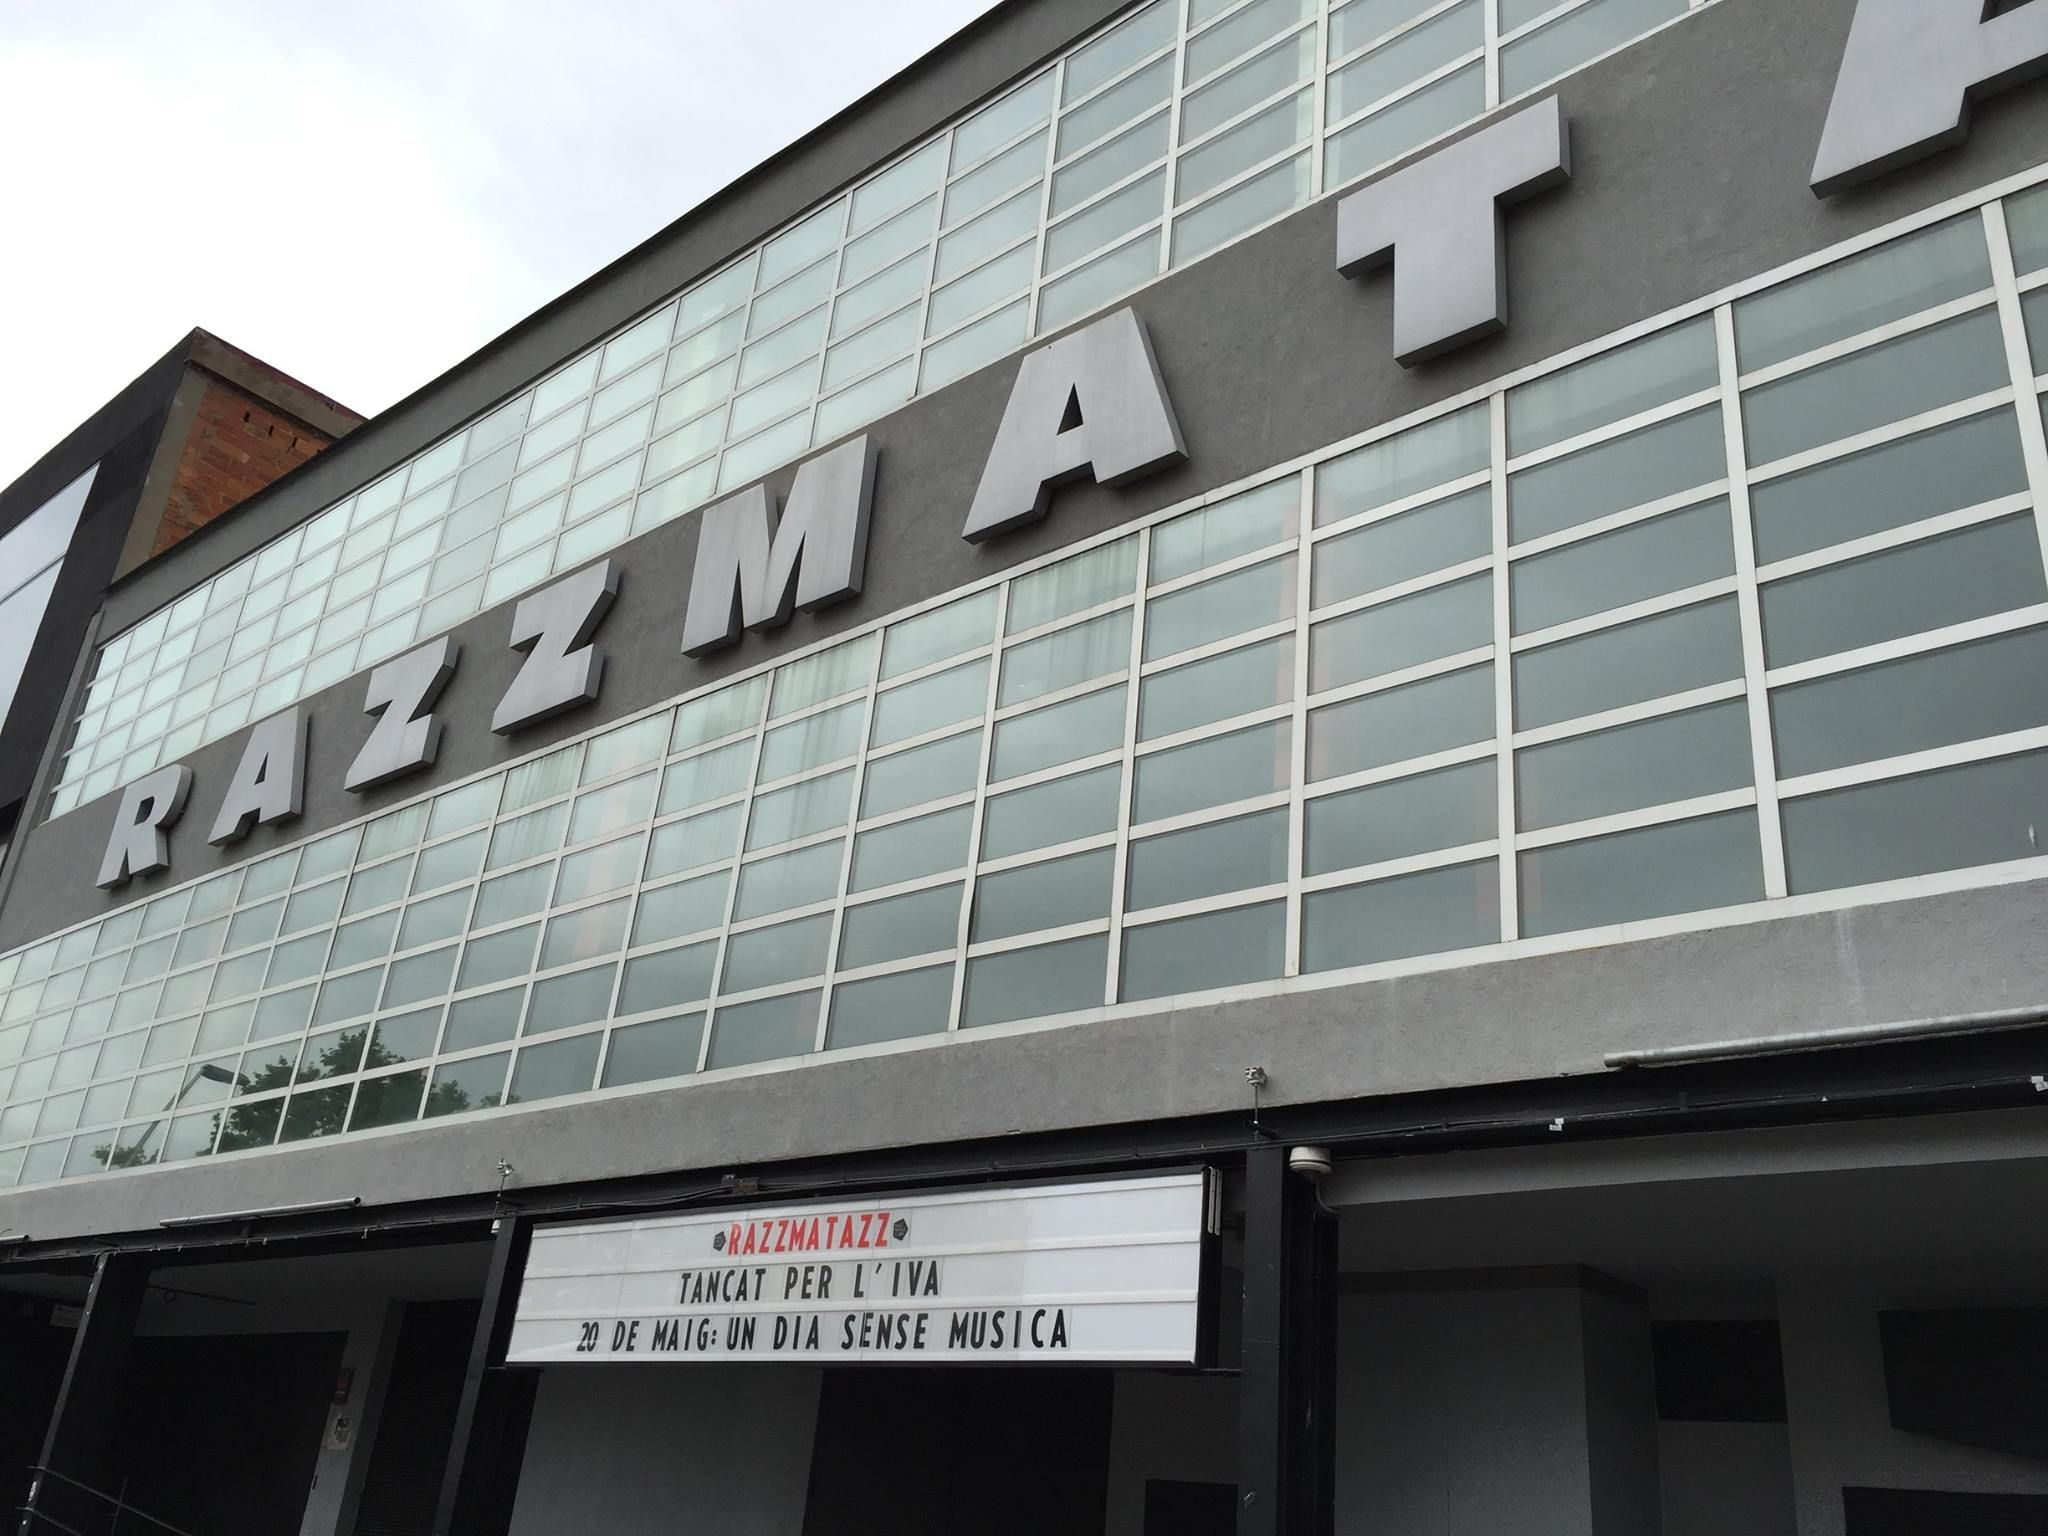 La sala Razzmatazz permanecerá hoy cerrada. #undiasinmusica